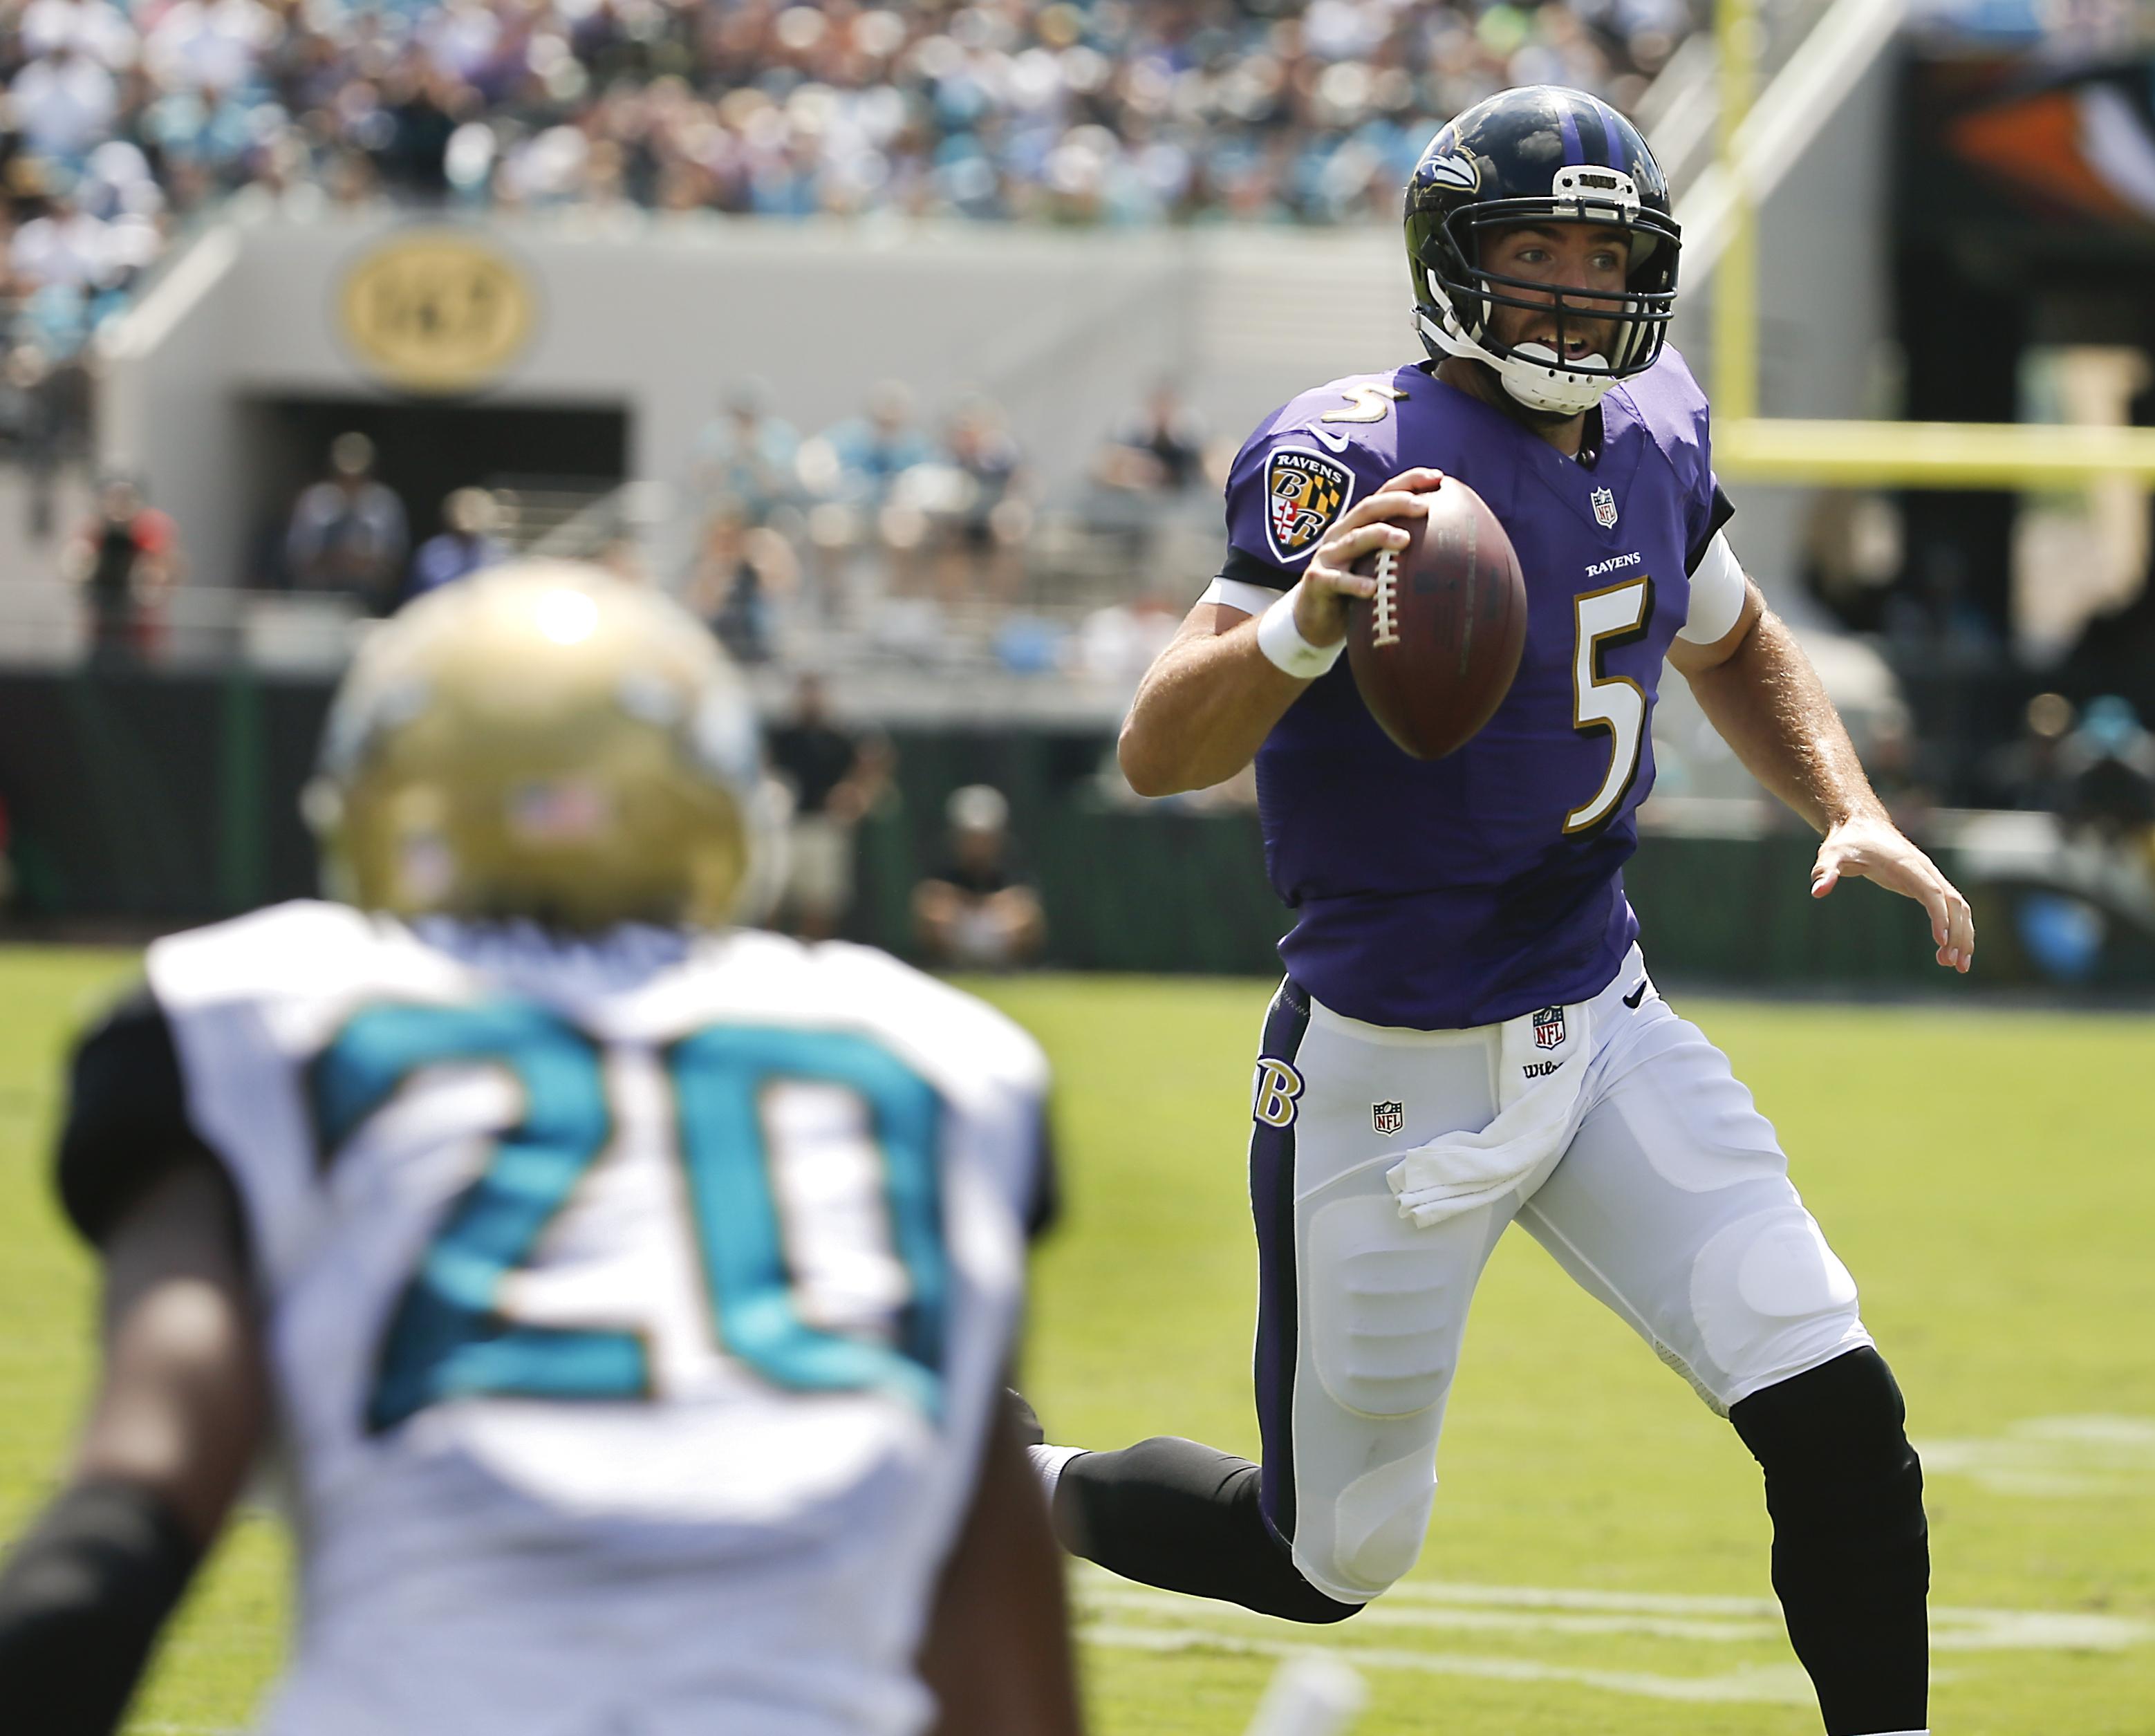 Baltimore Ravens quarterback Joe Flacco (5) rushes past Jacksonville Jaguars cornerback Jalen Ramsey (20) for a 7-yard touchdown run during the first half of an NFL football game in Jacksonville, Fla., Sunday, Sept. 25, 2016. (AP Photo/Stephen B. Morton)